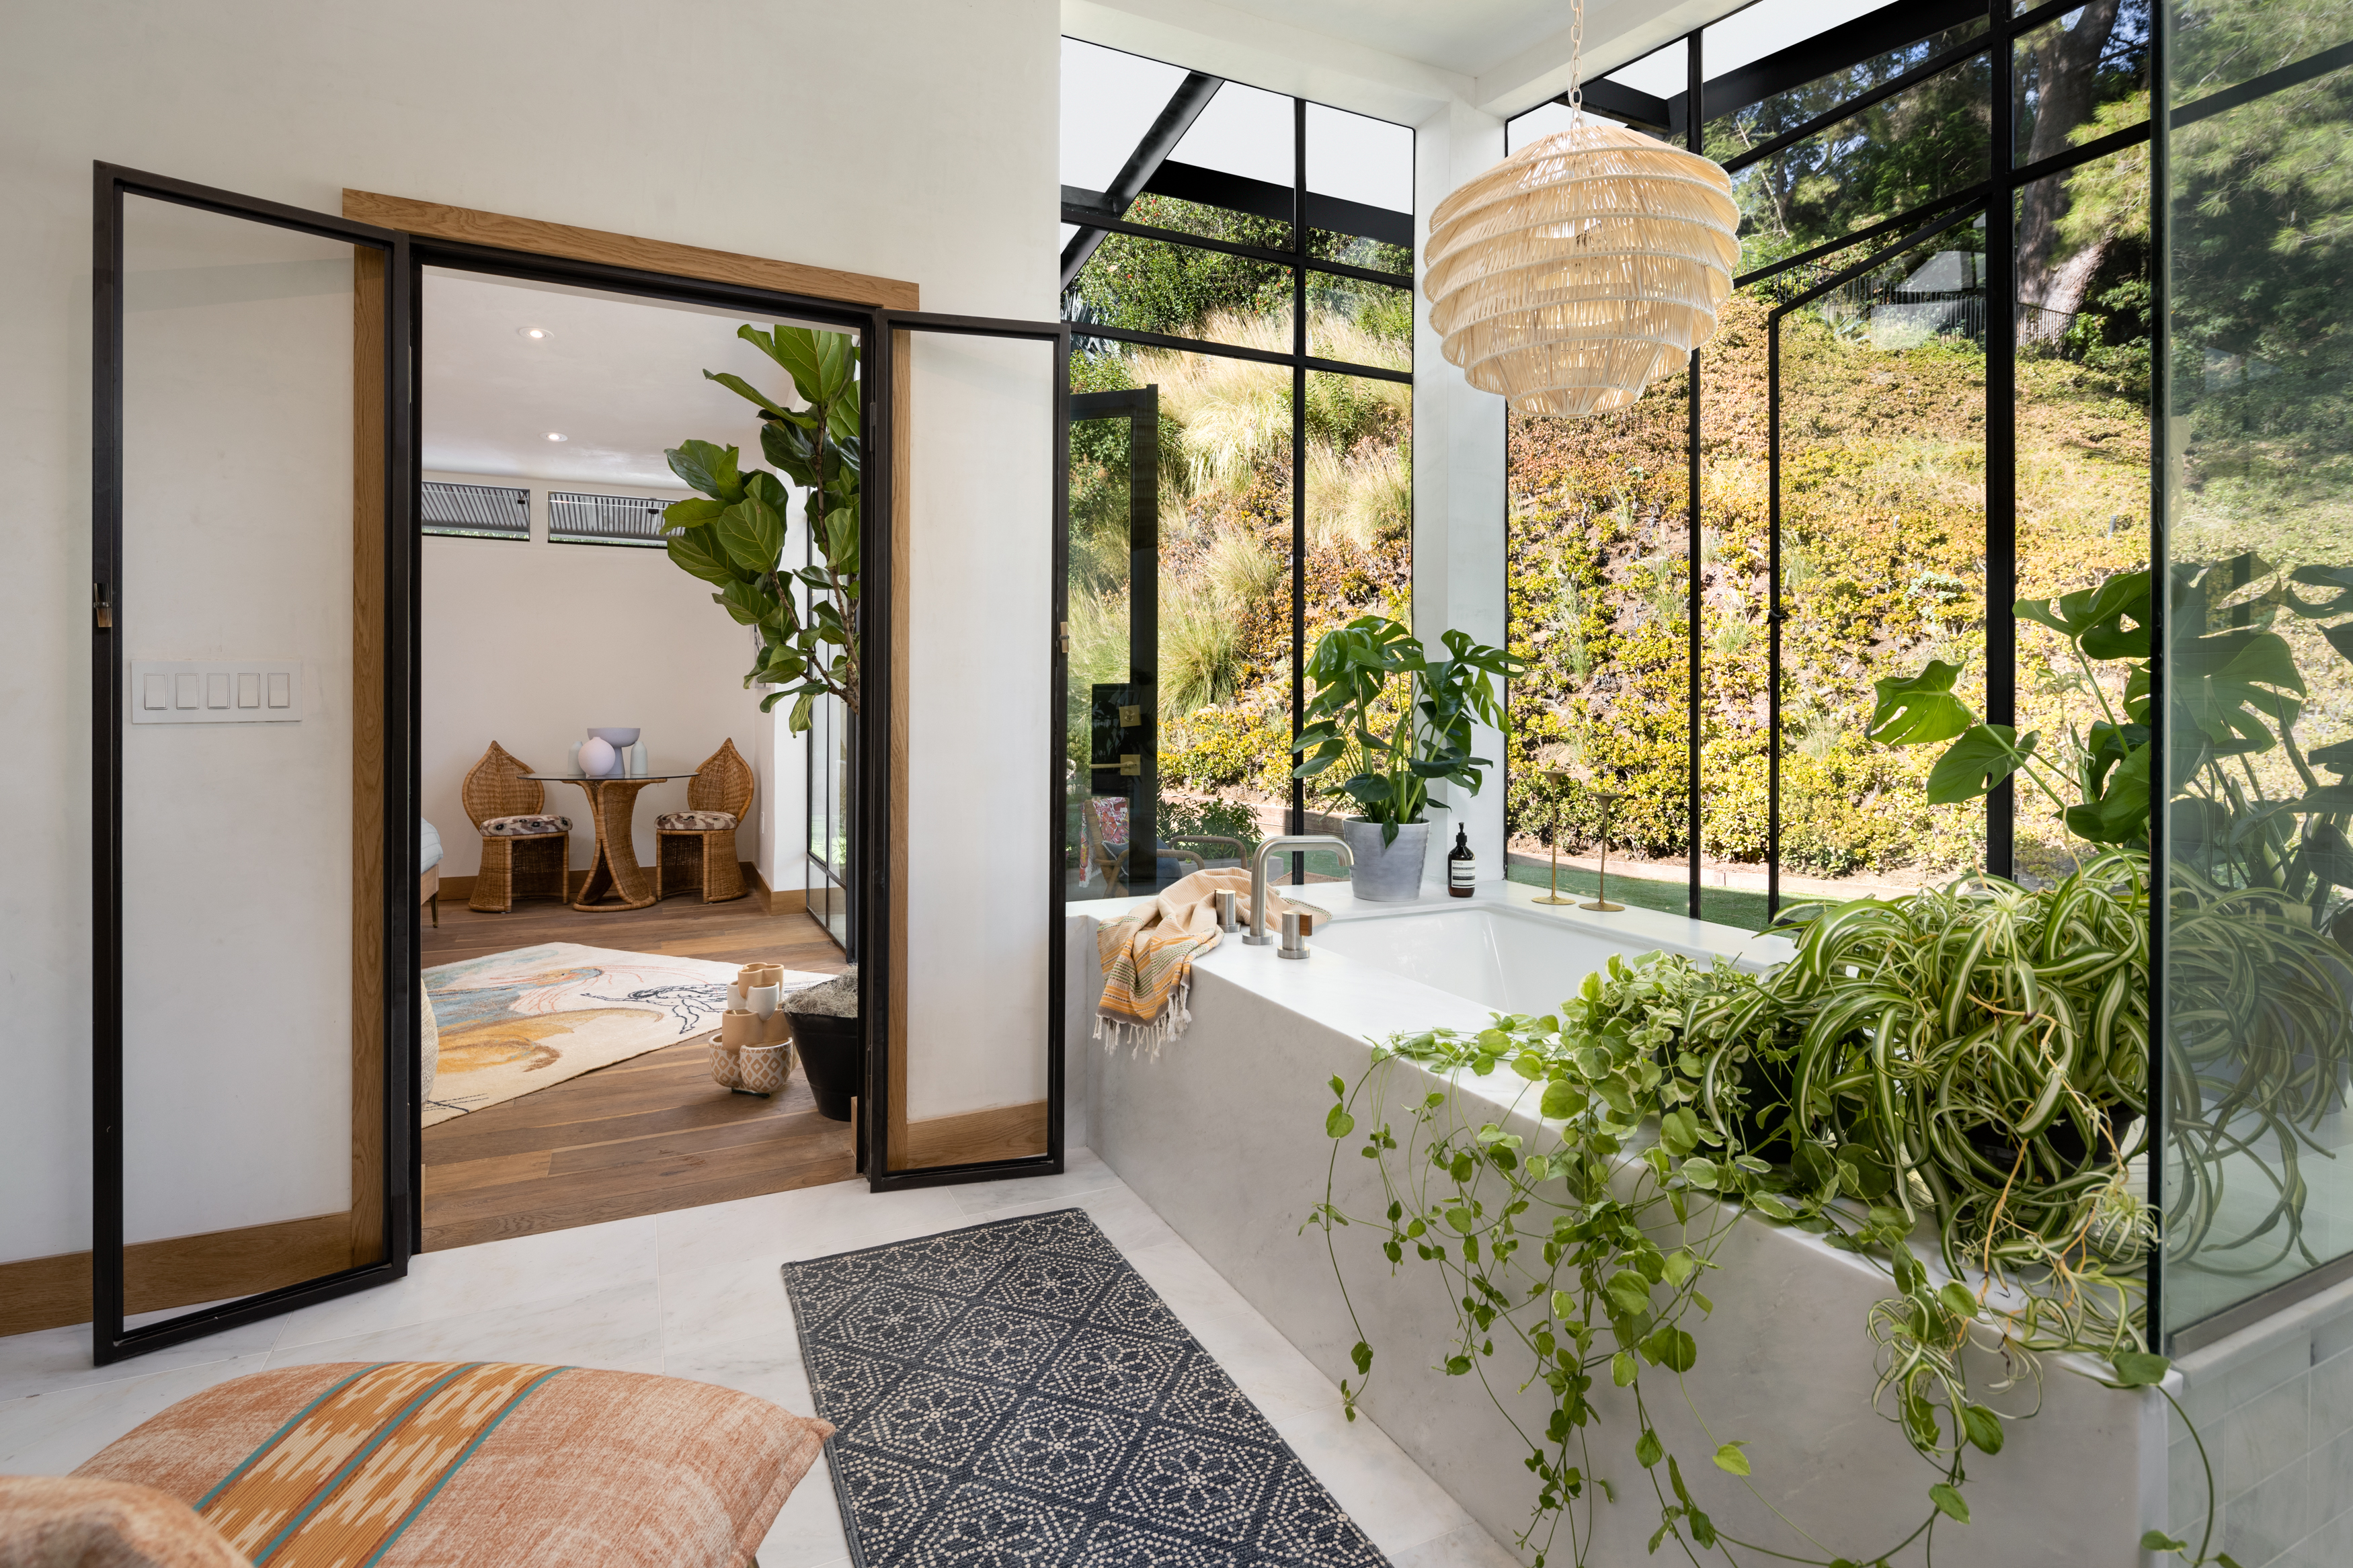 Designer Kim Gordon rolls out her latest creation in Laurel Canyon